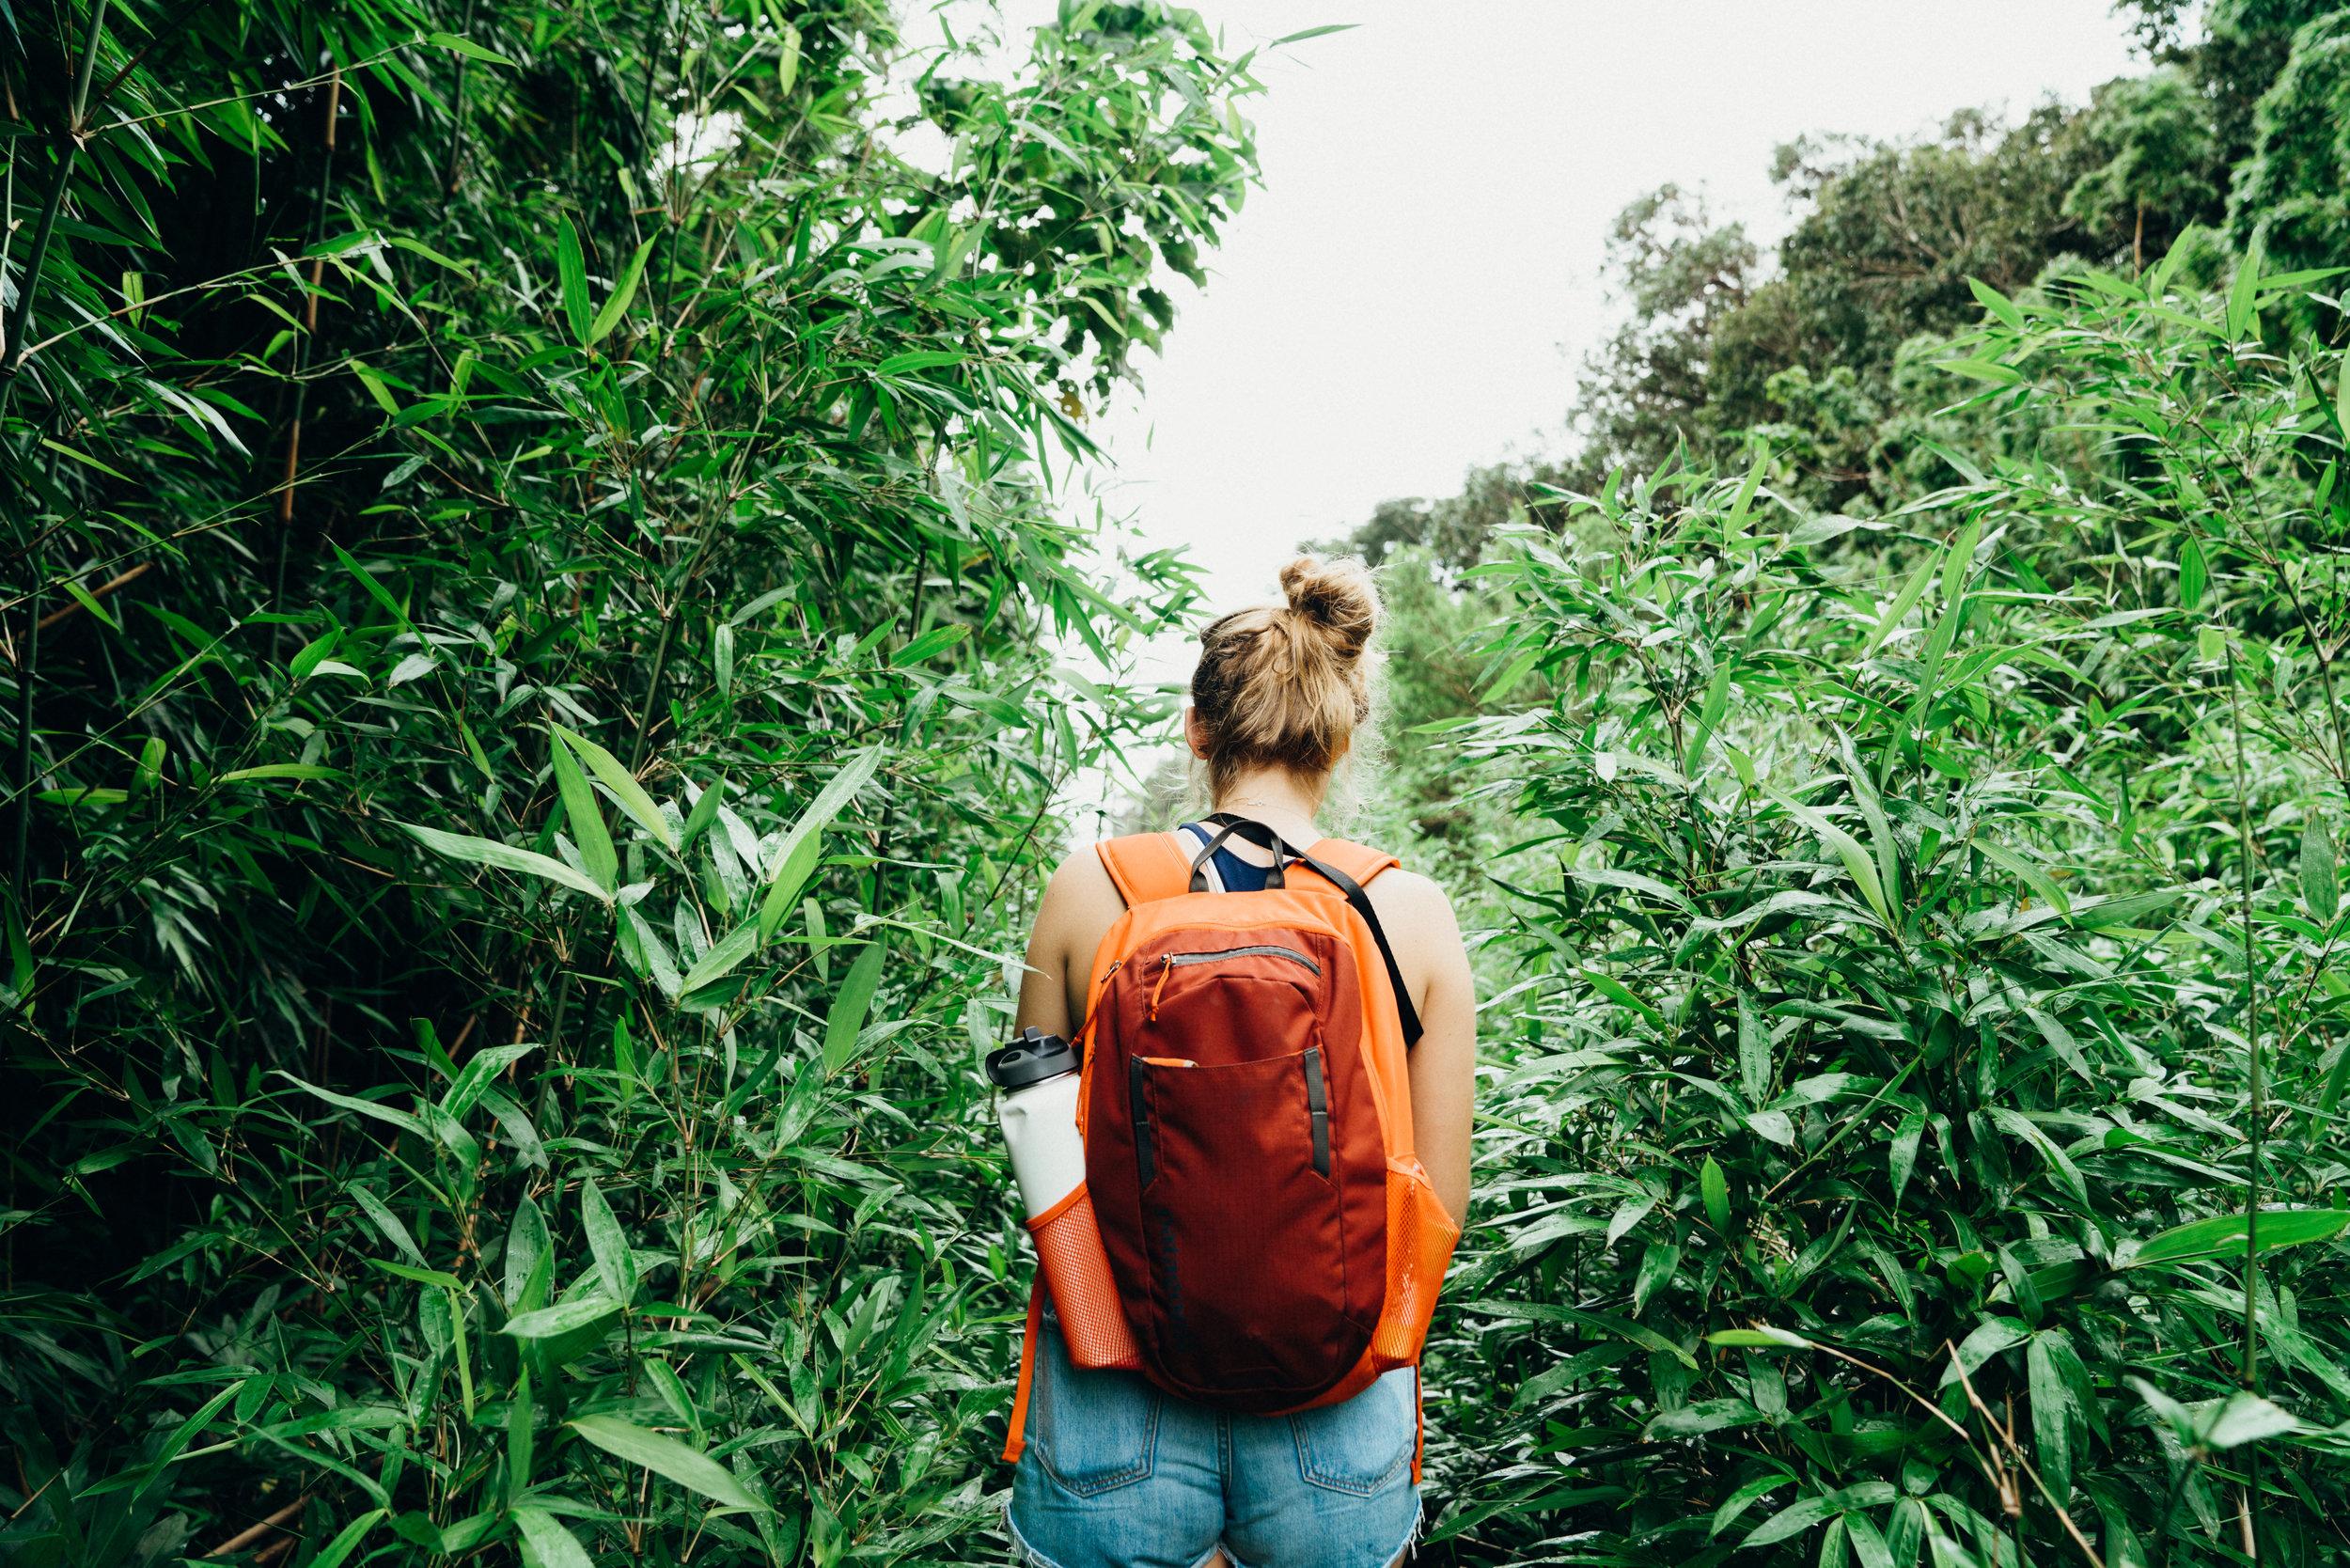 Girl Hiking in Jungle